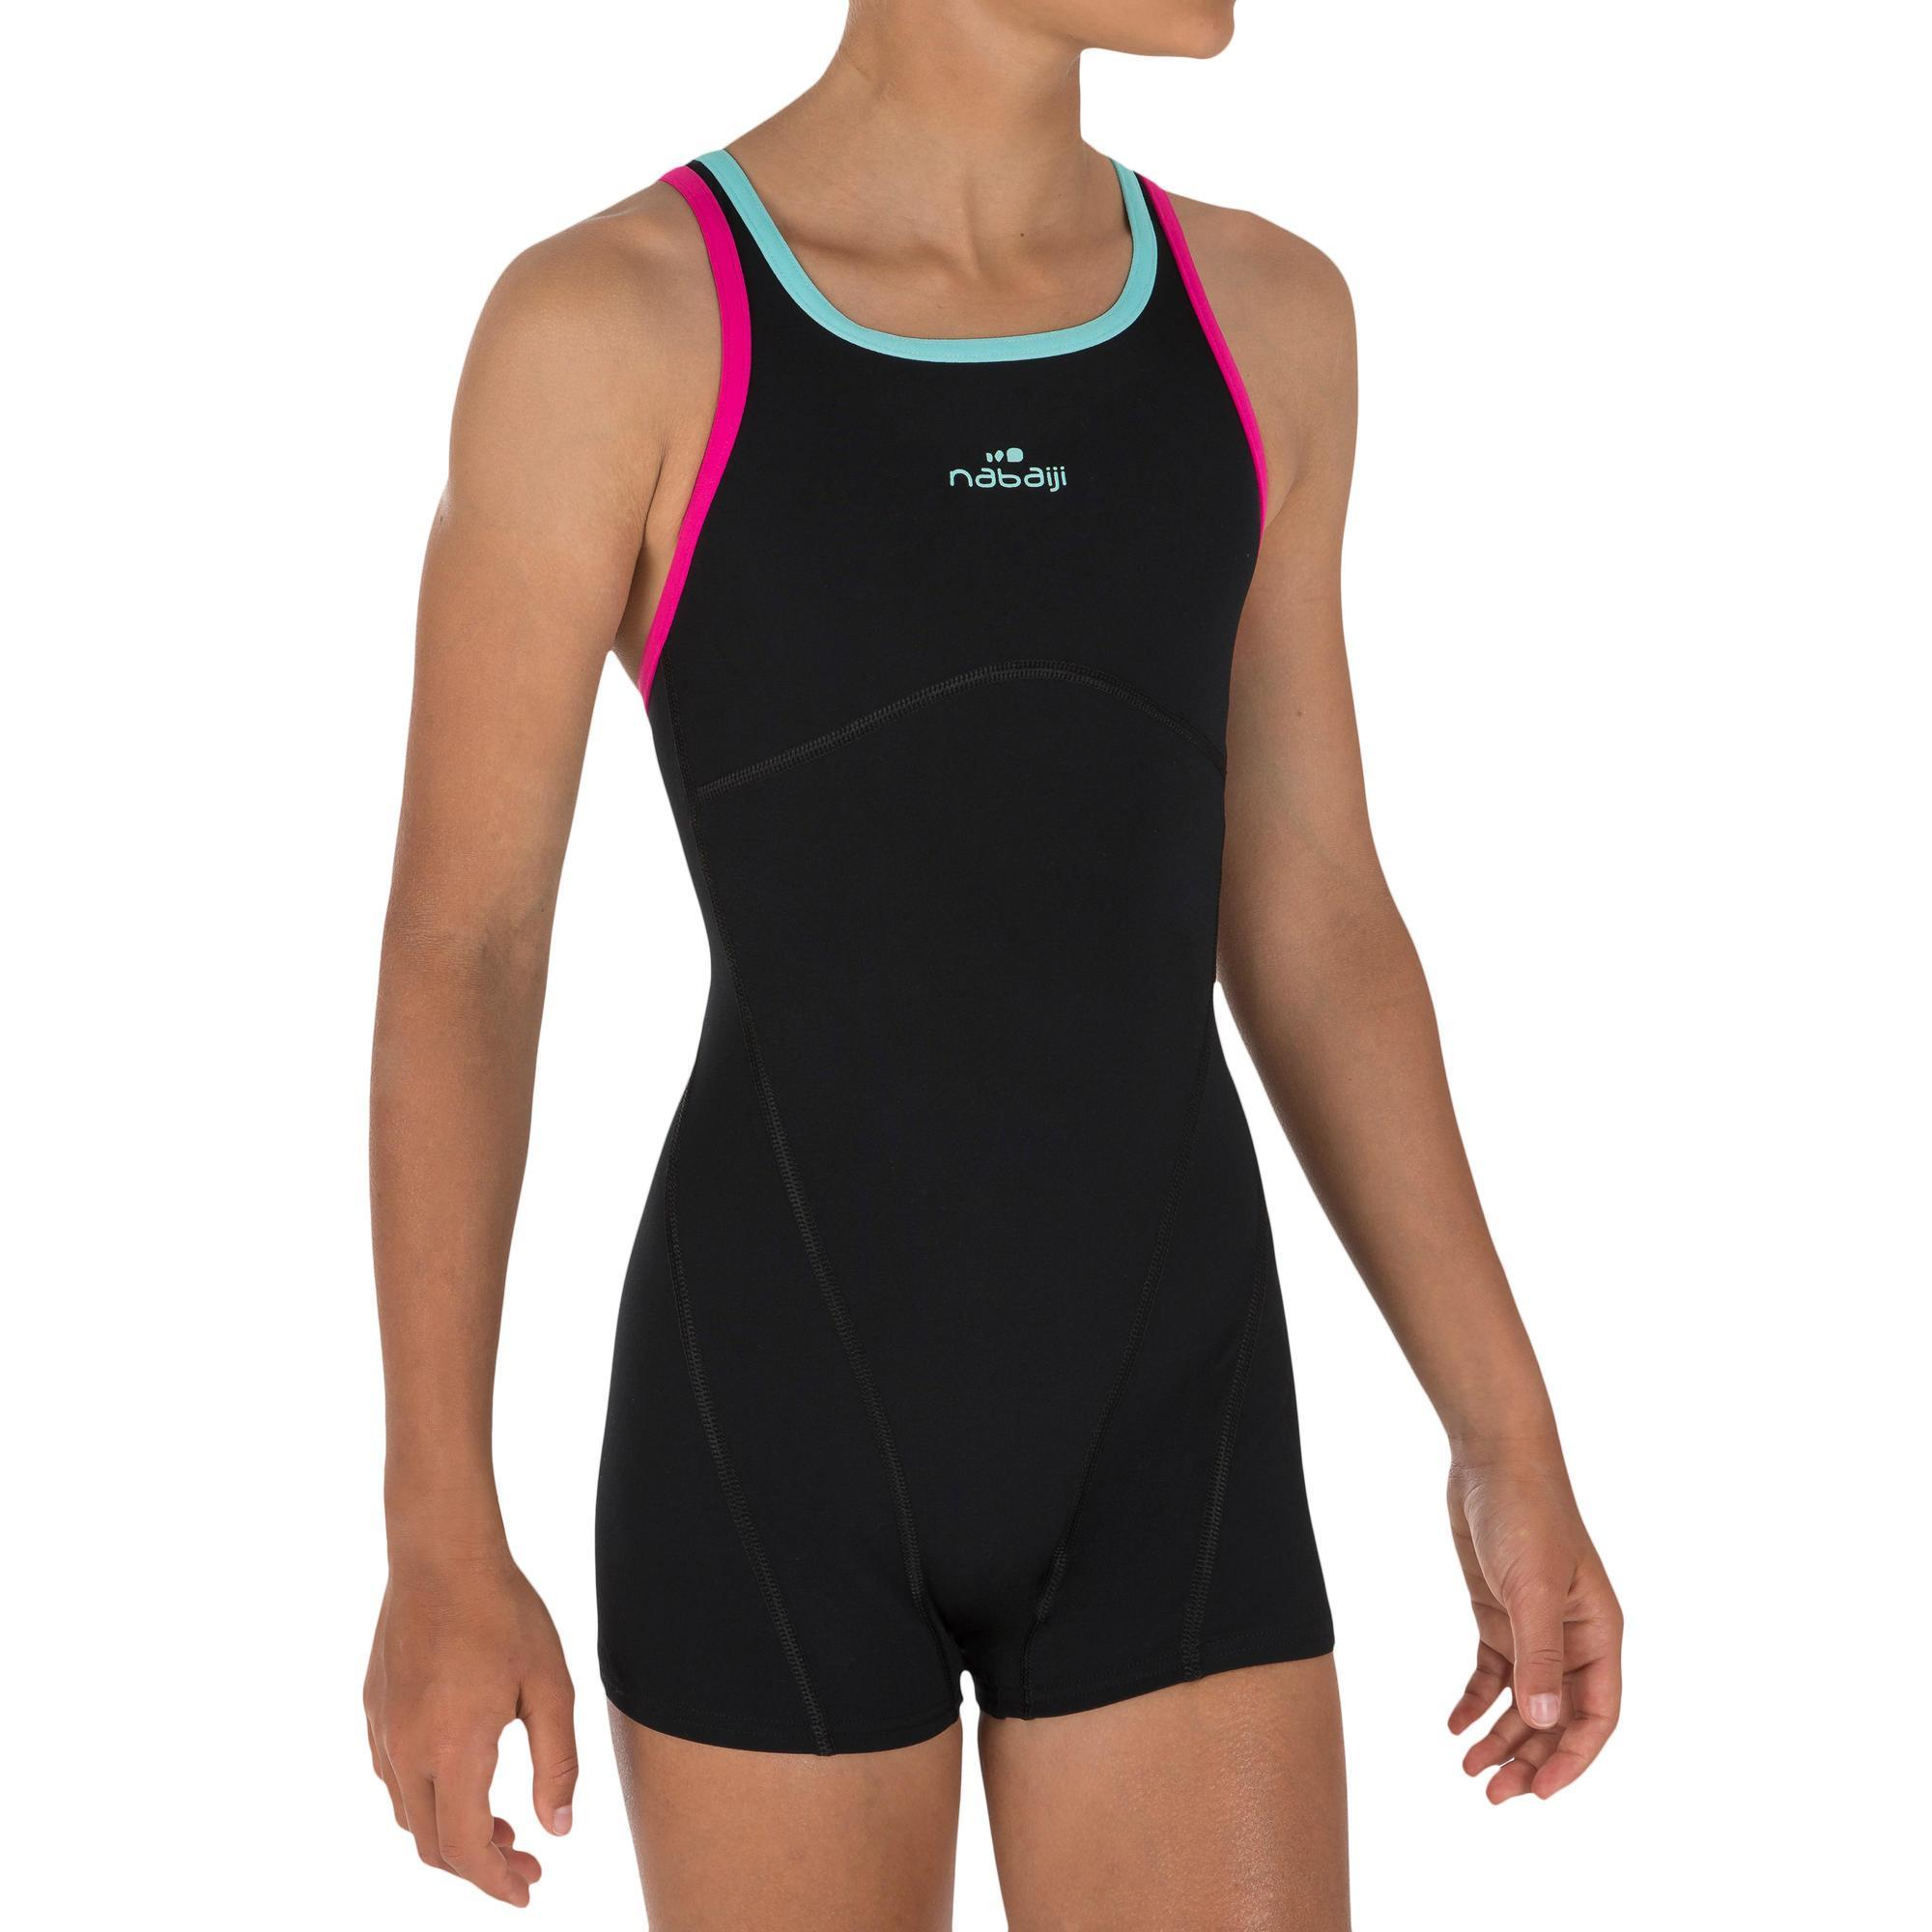 Kamiye Girls One Piece Legsuit Swimsuit Shorty Suit